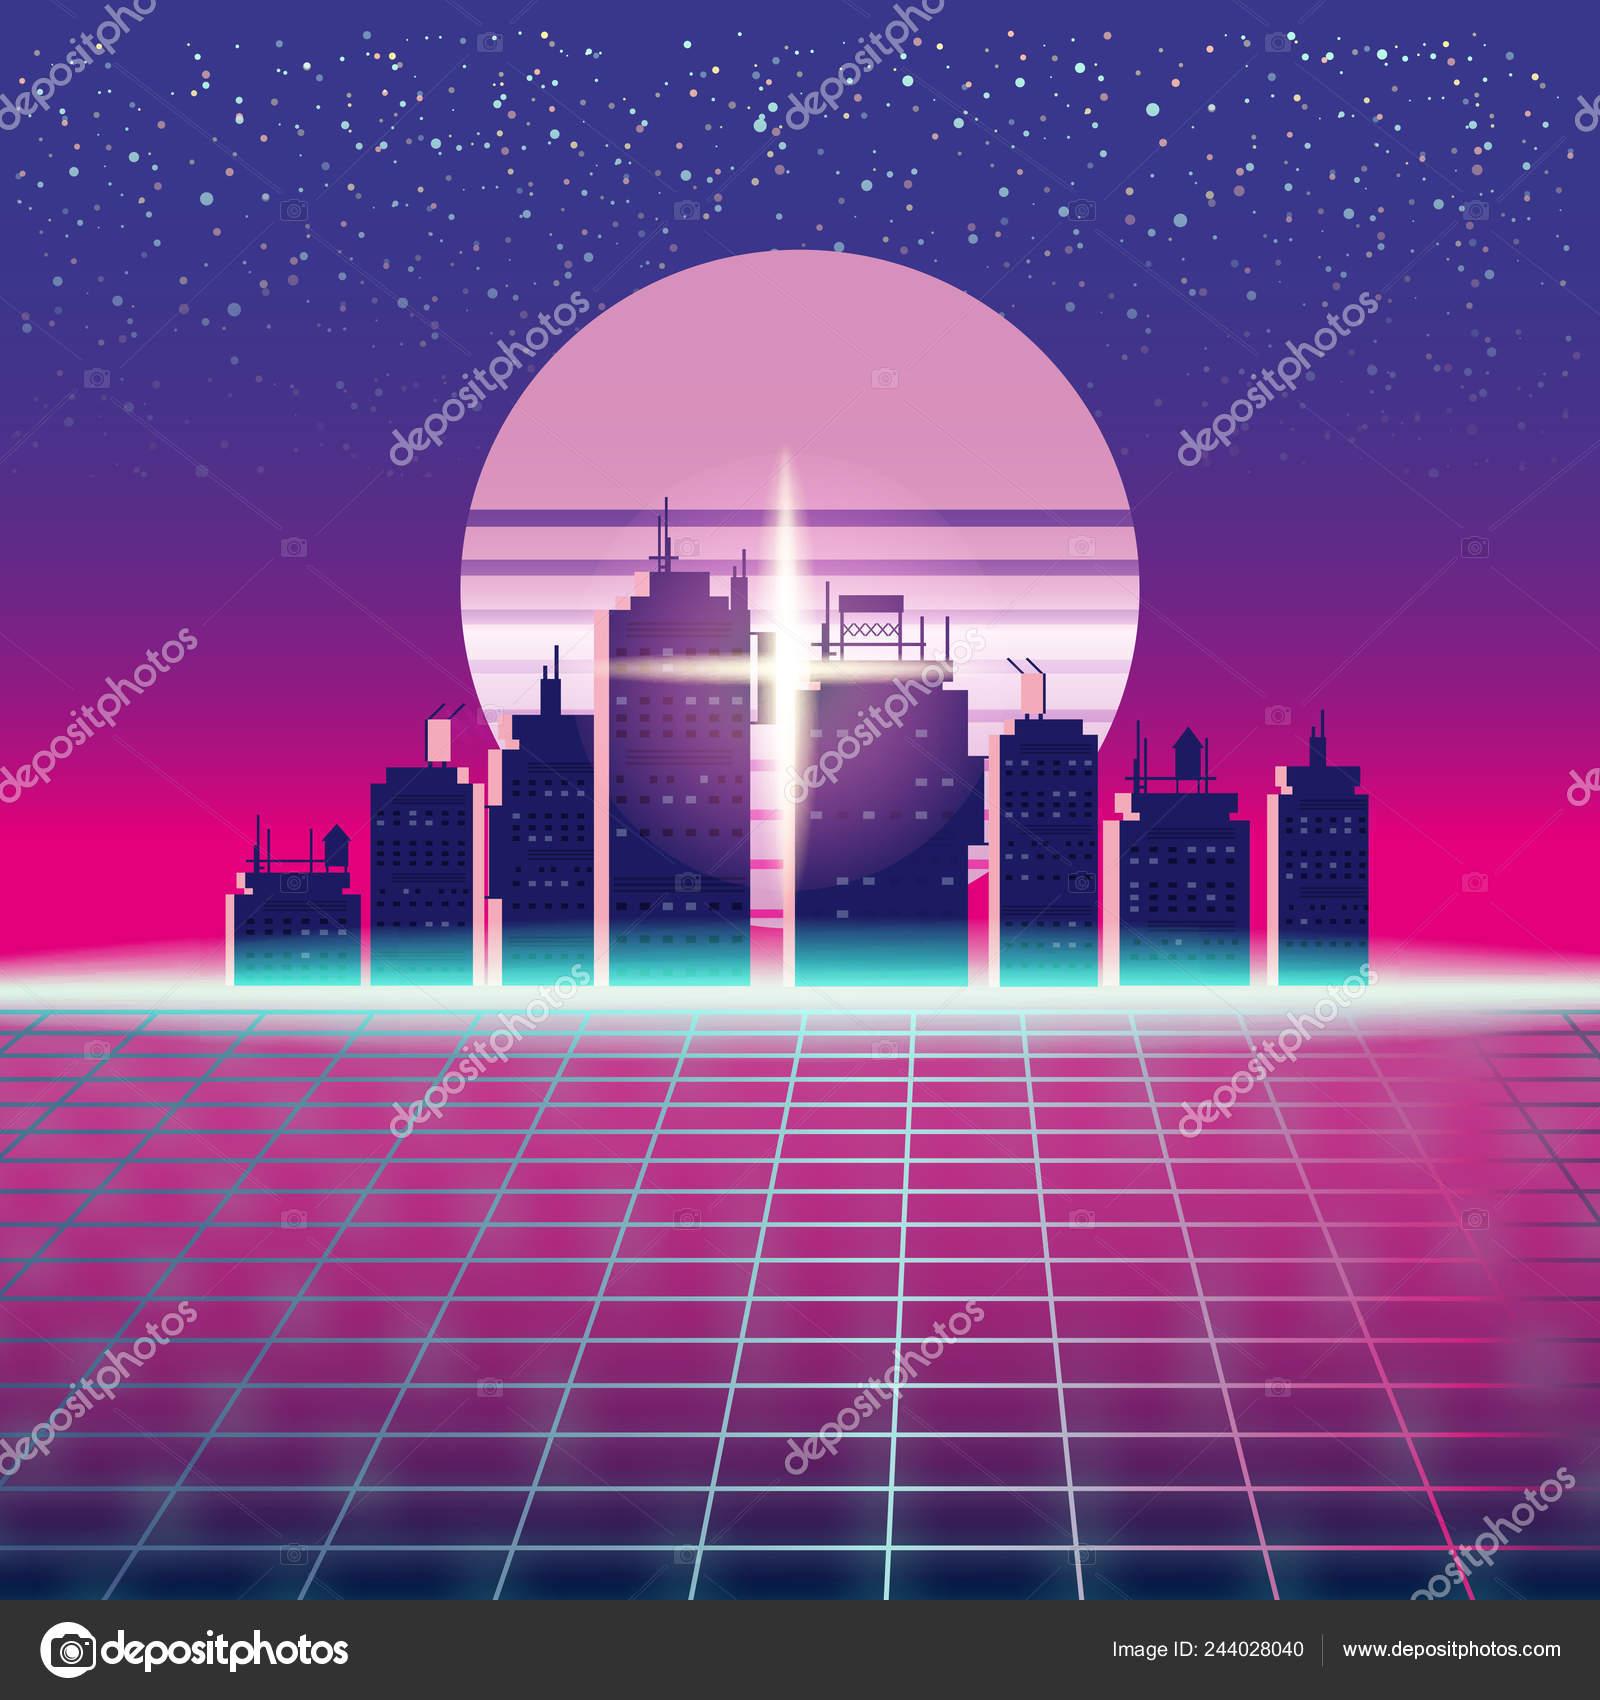 Synthwave Retro Futuristic Landscape With City, Sun, Stars And